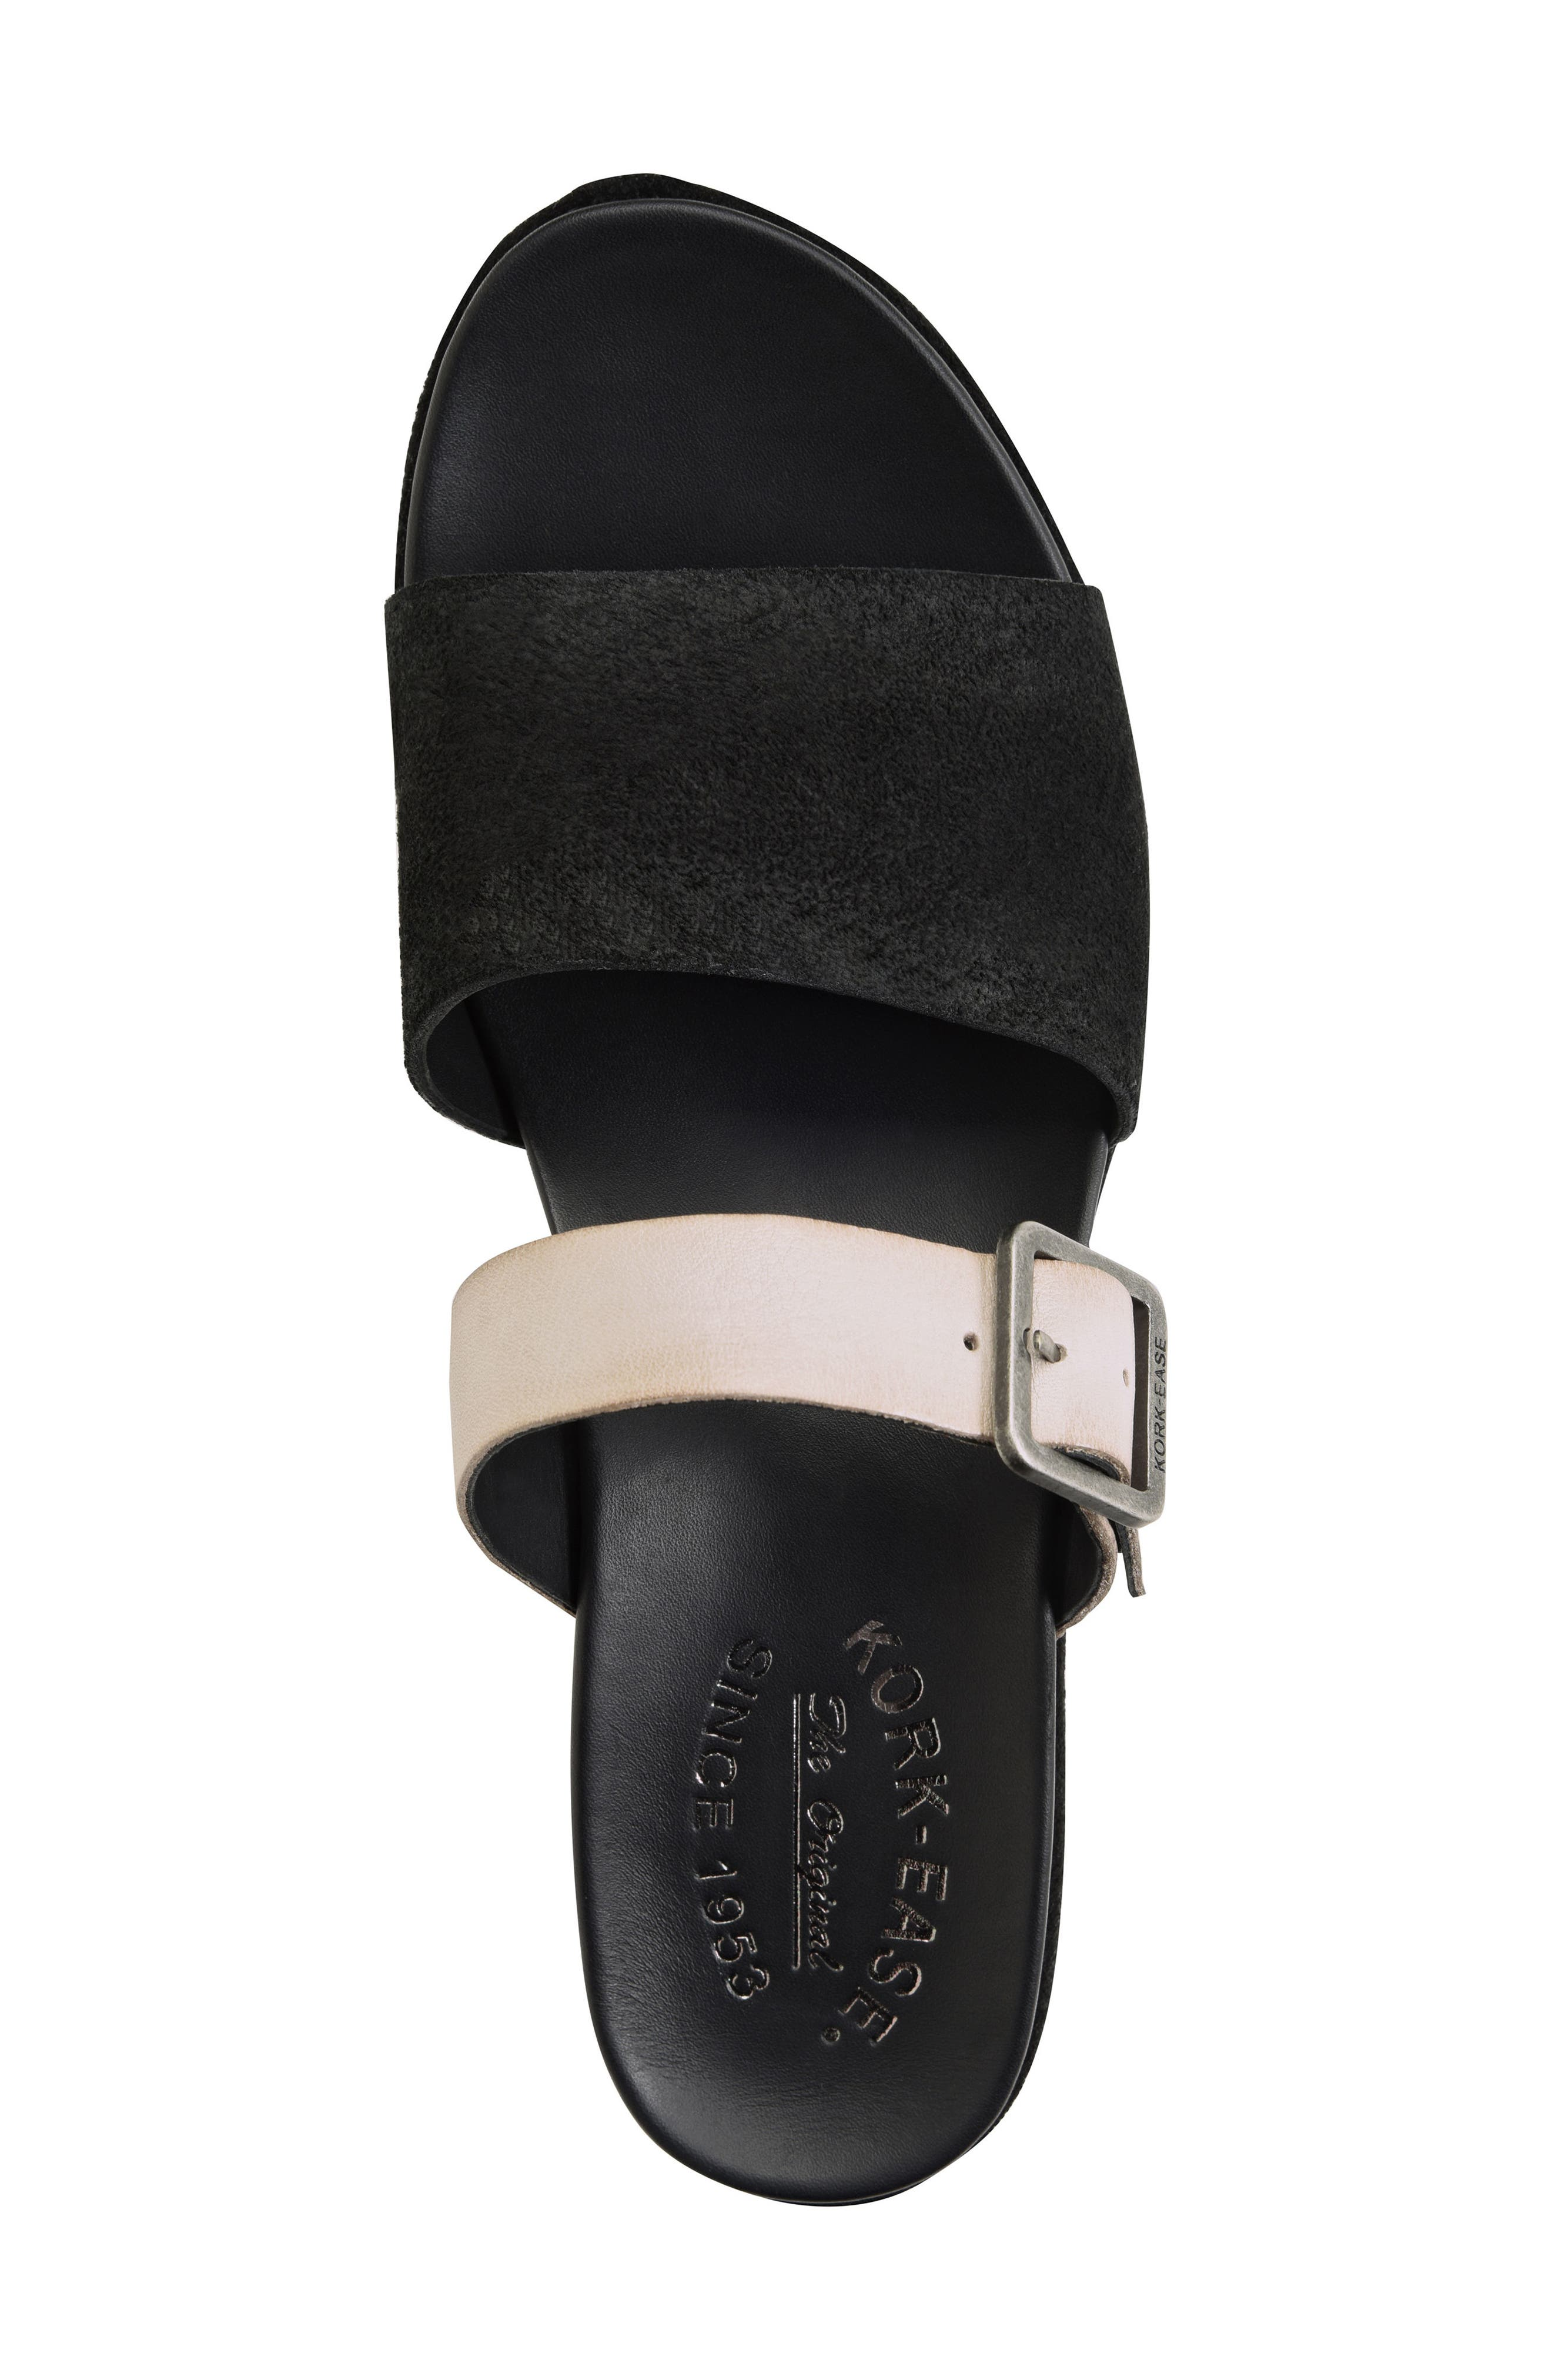 Bisti Wedge Slide Sandal,                             Alternate thumbnail 4, color,                             BLACK/ GREY LEATHER